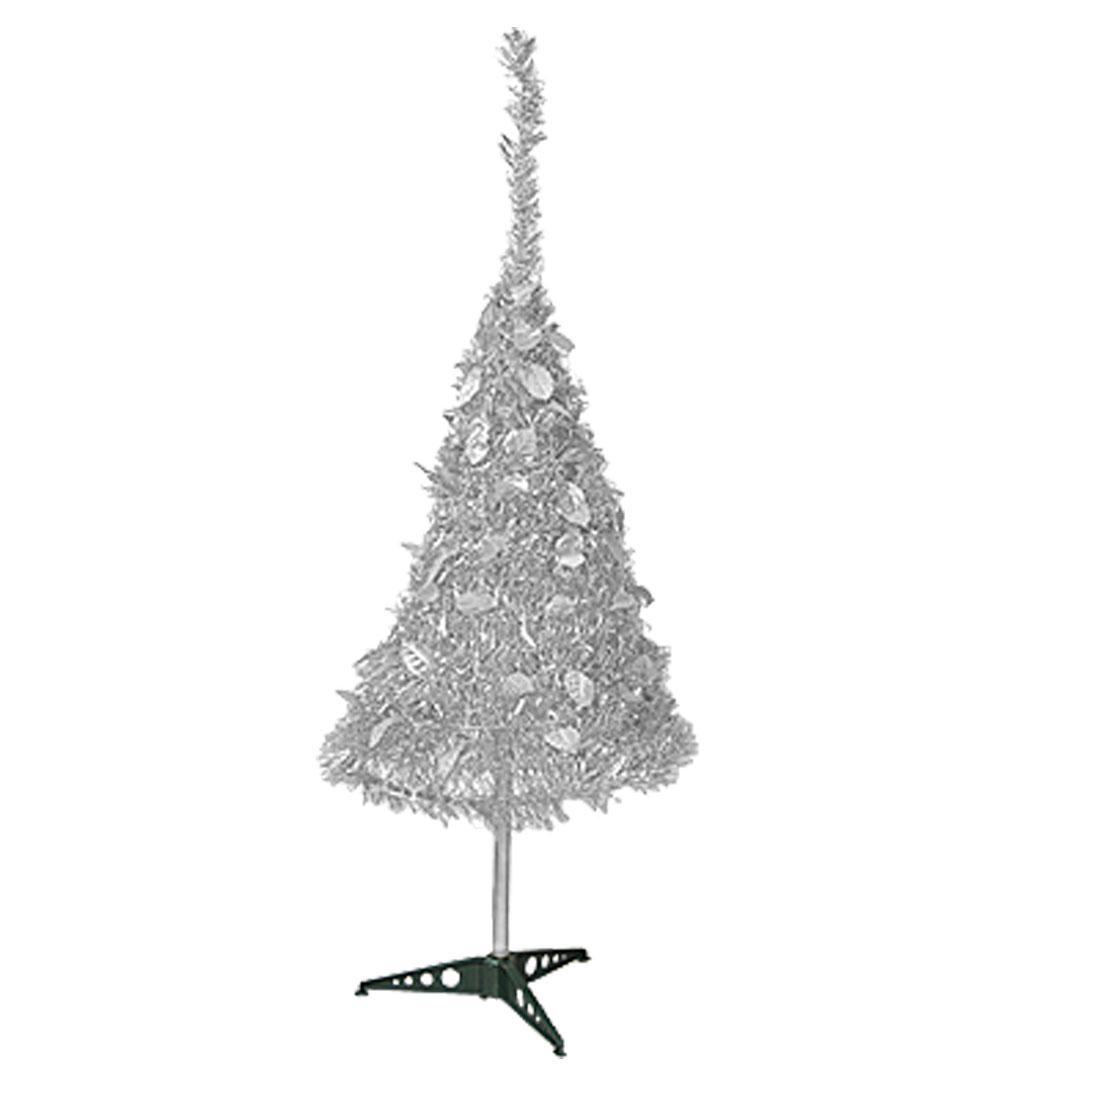 "41 3/4"" Silver Tone Shiny Tinsel Garland Foldable X'mas Christmas Tree Decoration"